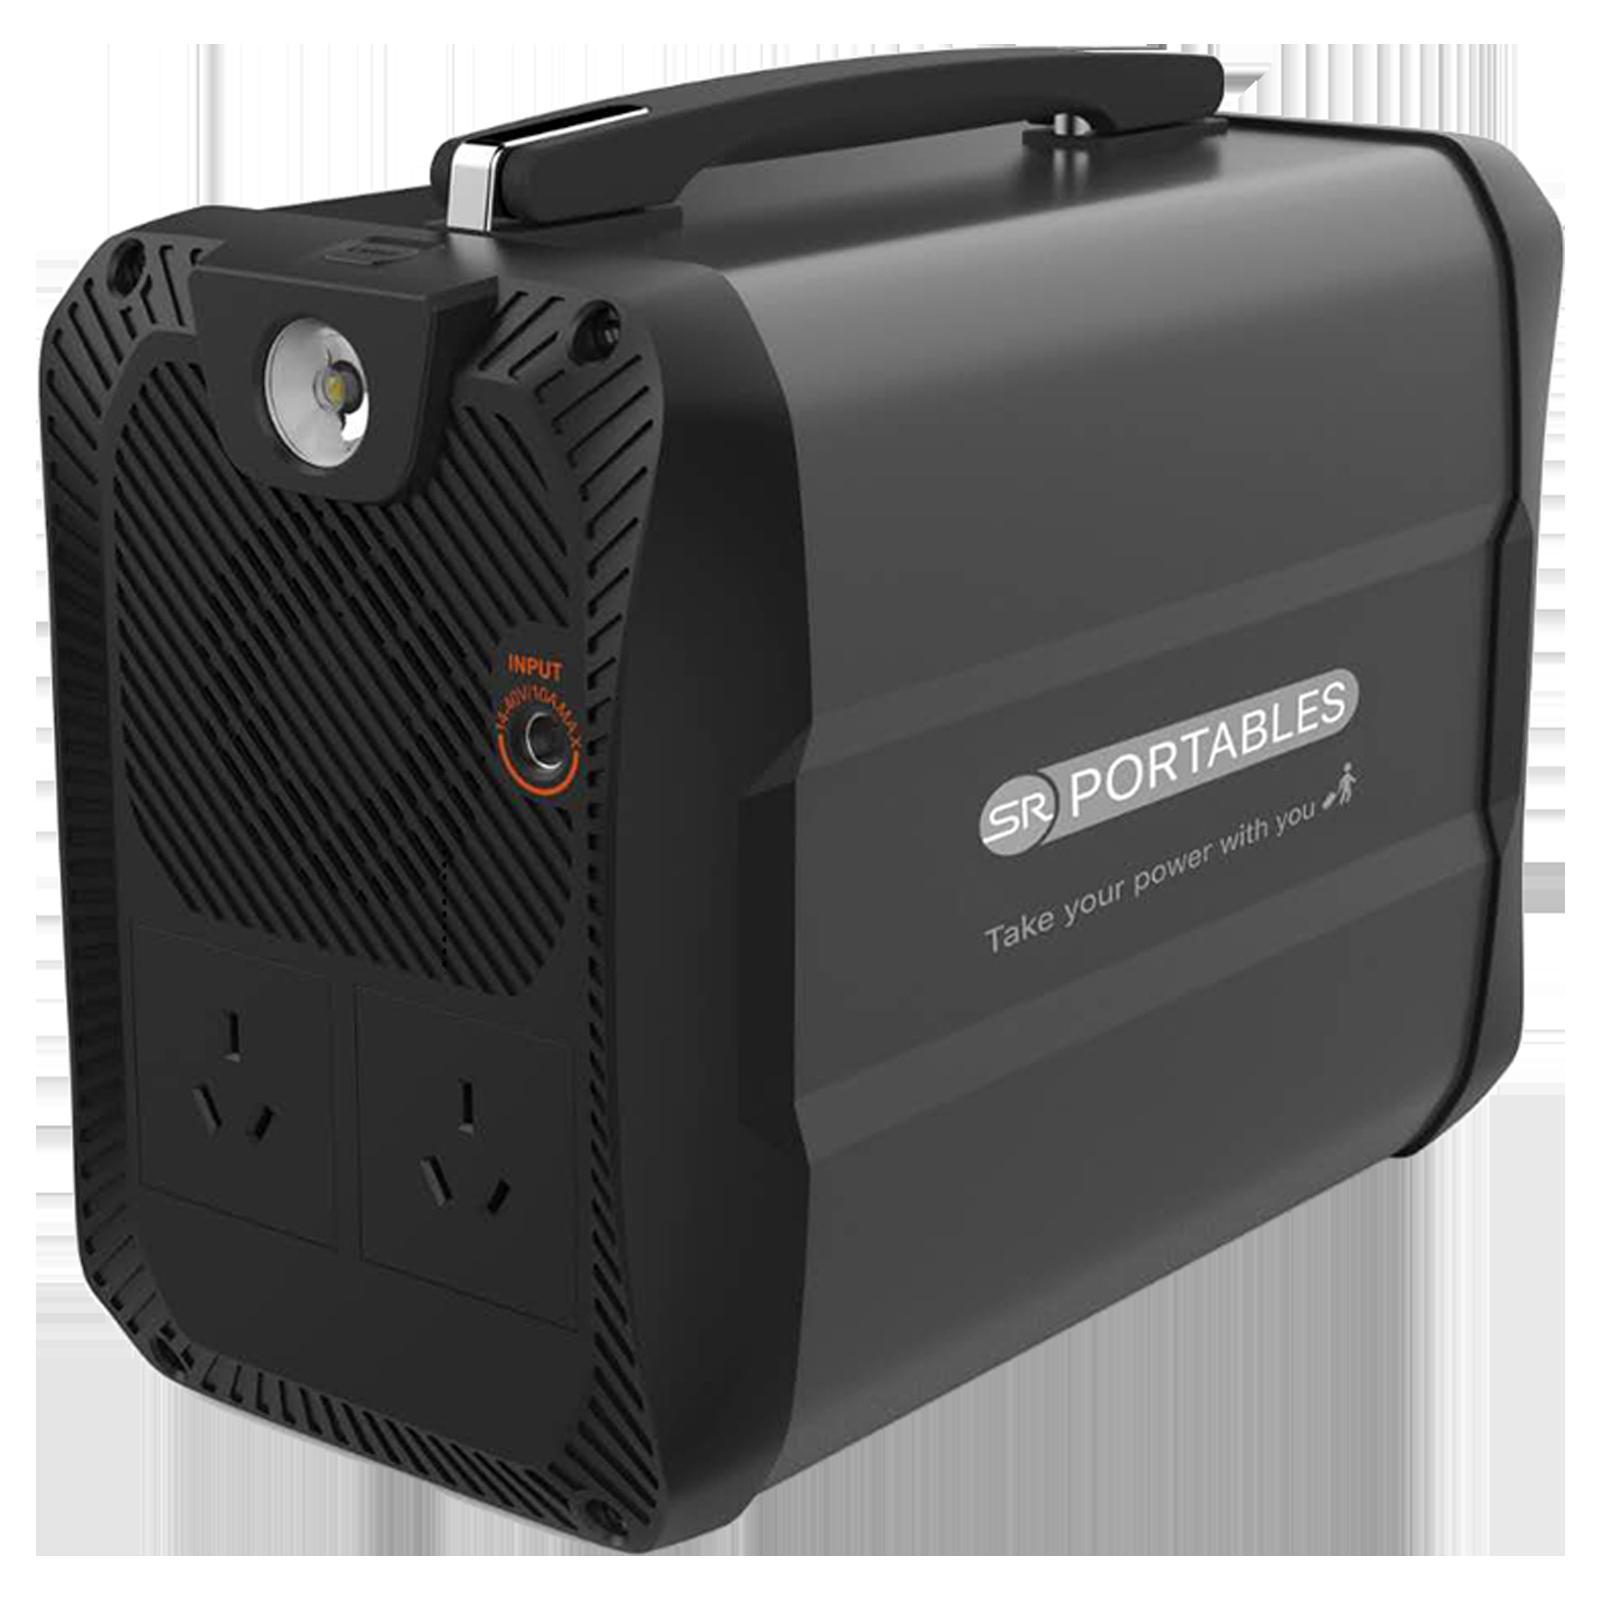 SR Portables Cleo 400Wh 300 Watts Portable Solar Generator (Water Resistant, SRCLEOSG, Black)_1